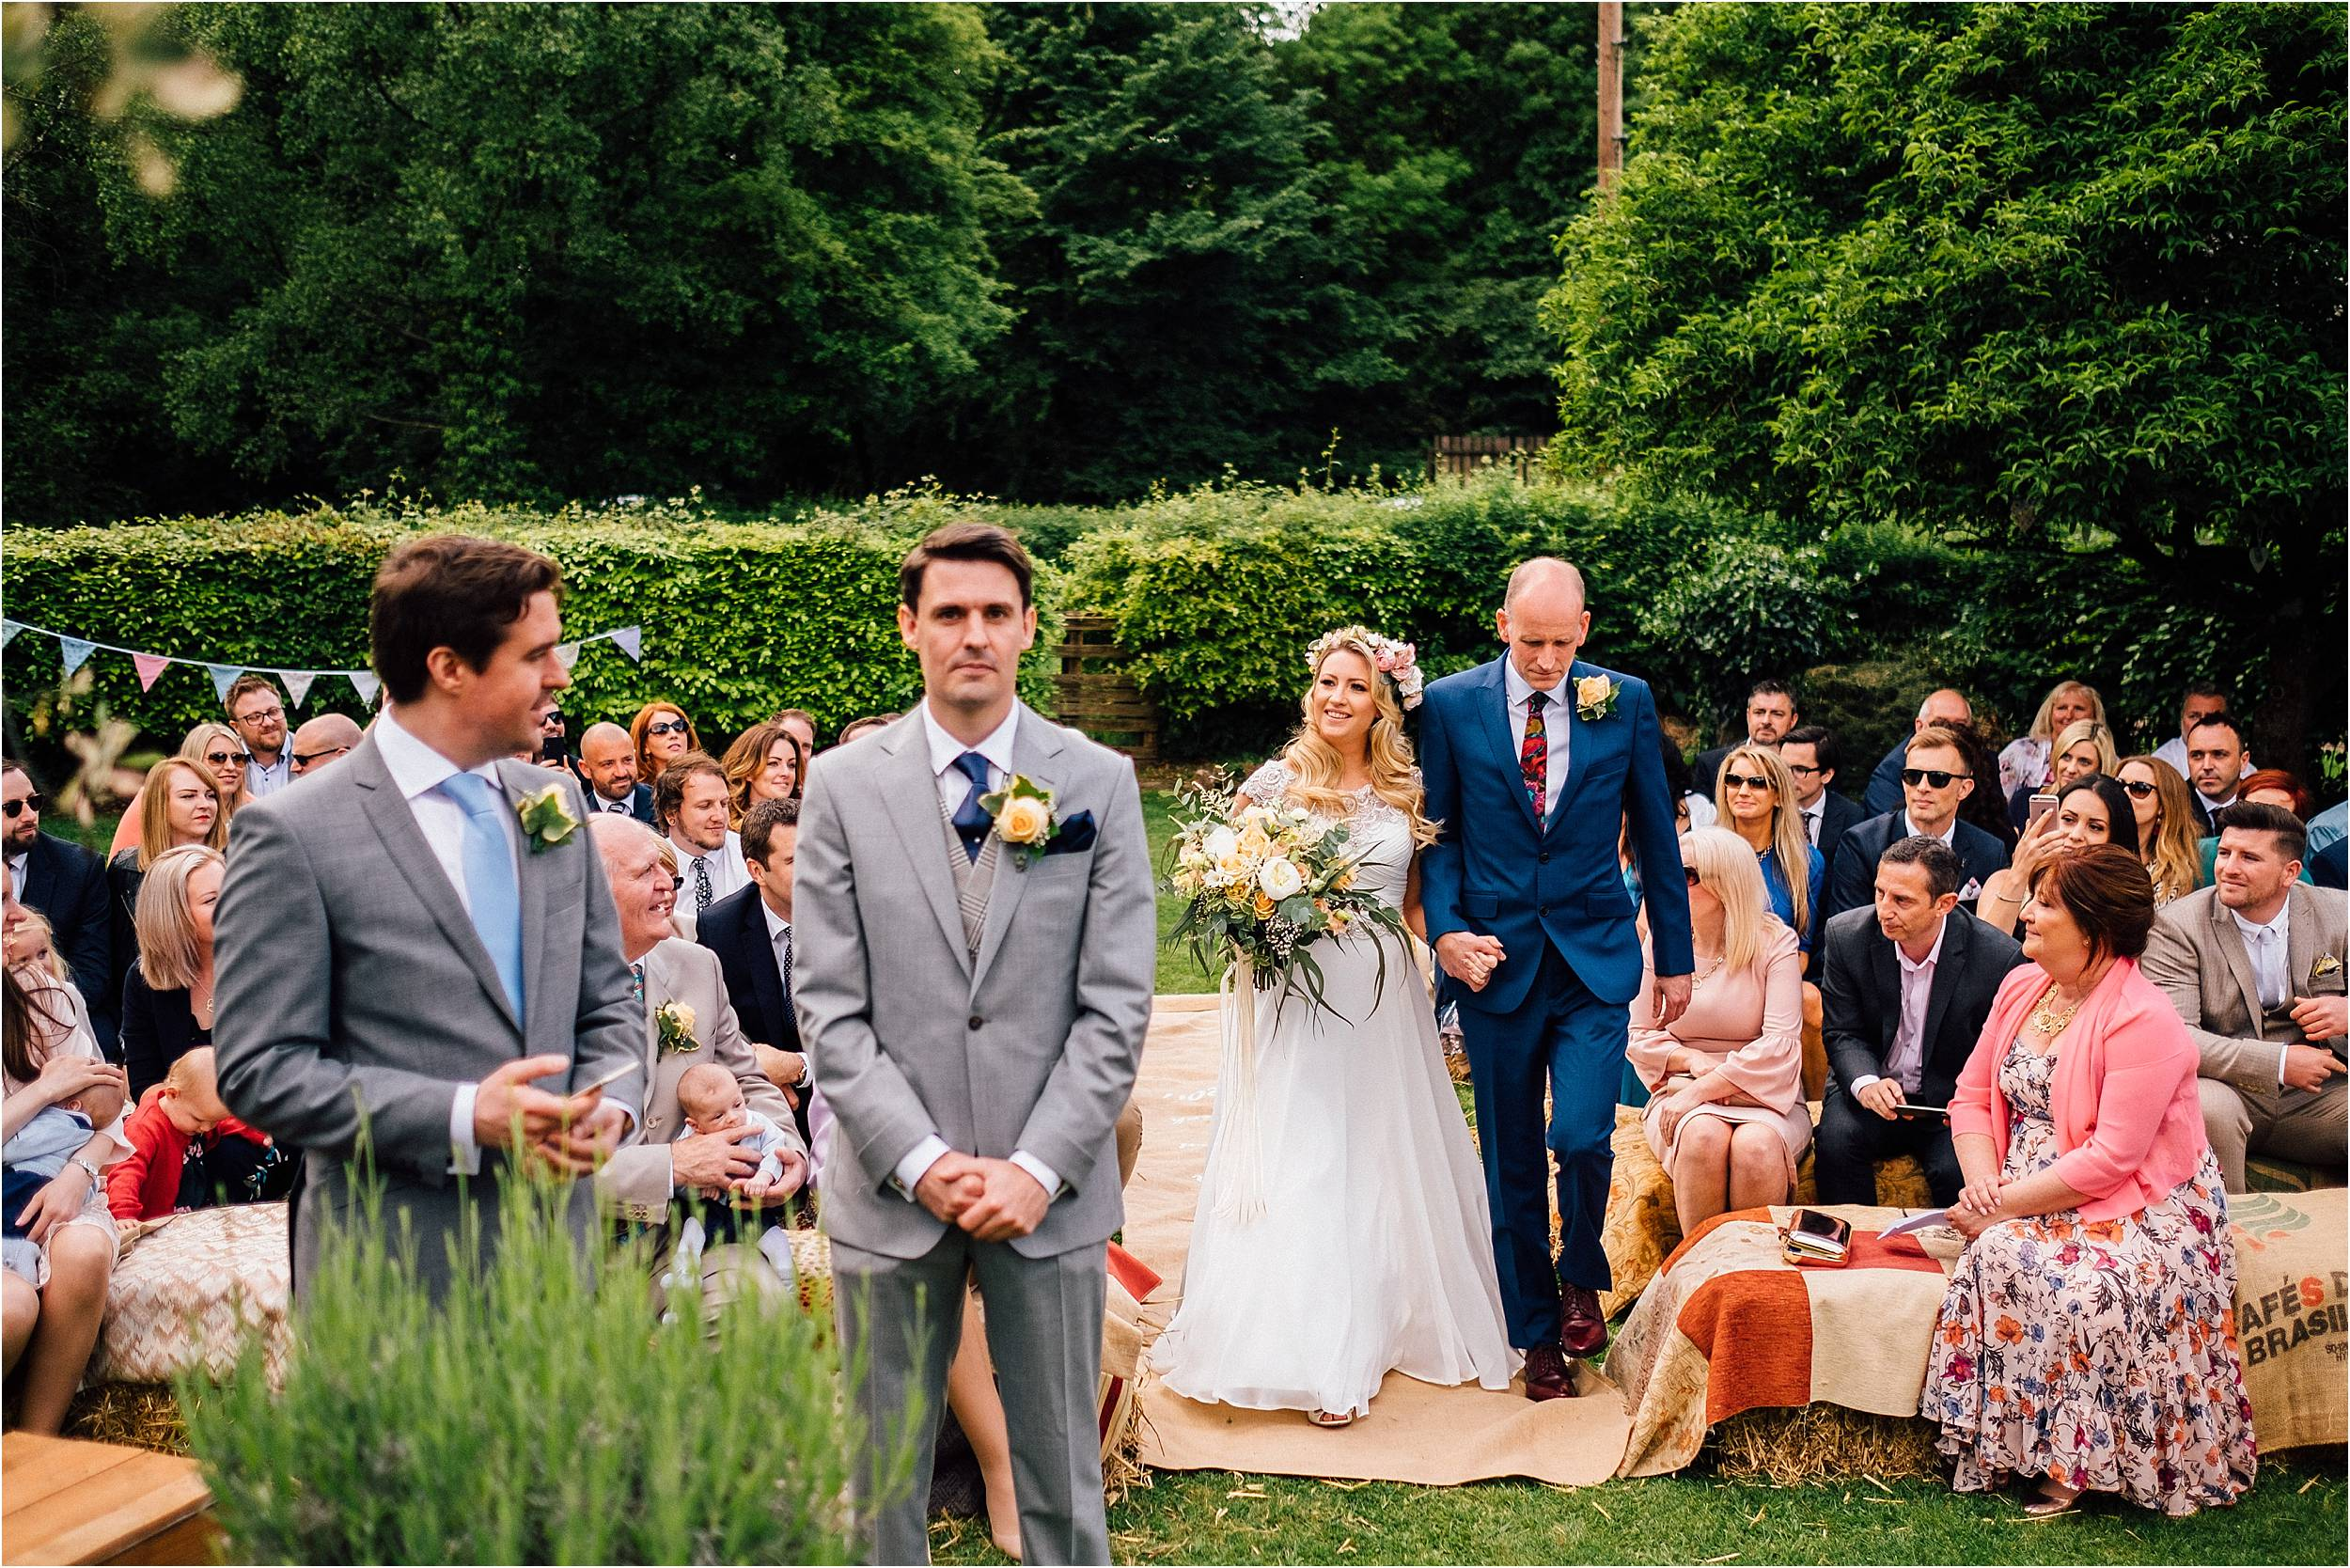 Surrey Hookhouse Farm Wedding Photographer_0043.jpg